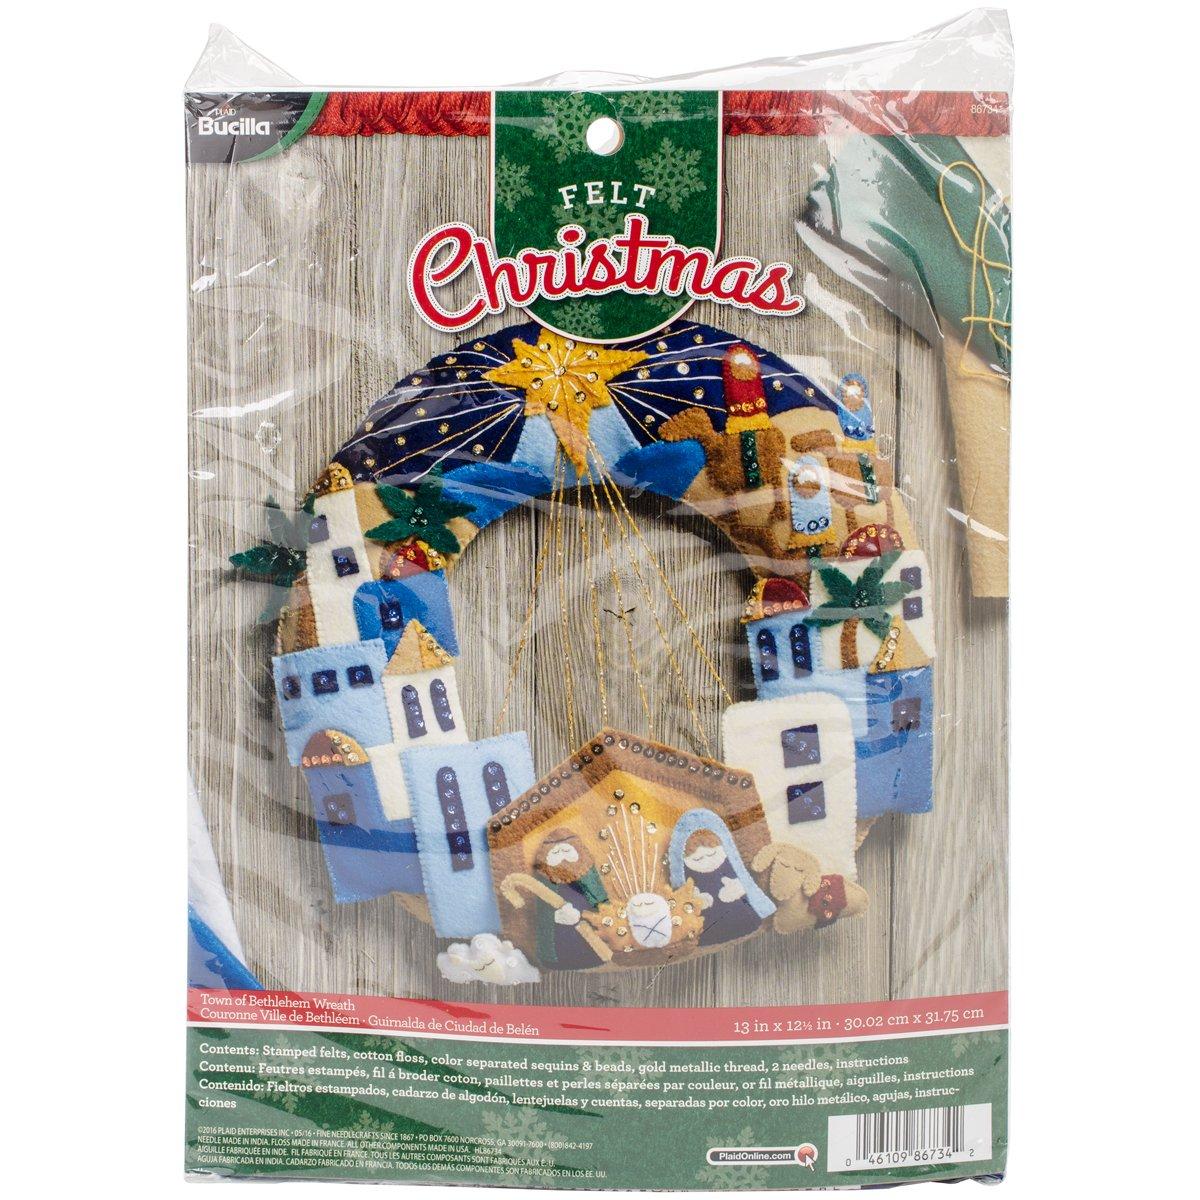 BUCILLA 86734 Felt Applique Wreath Town of Bethlehem, Size 13